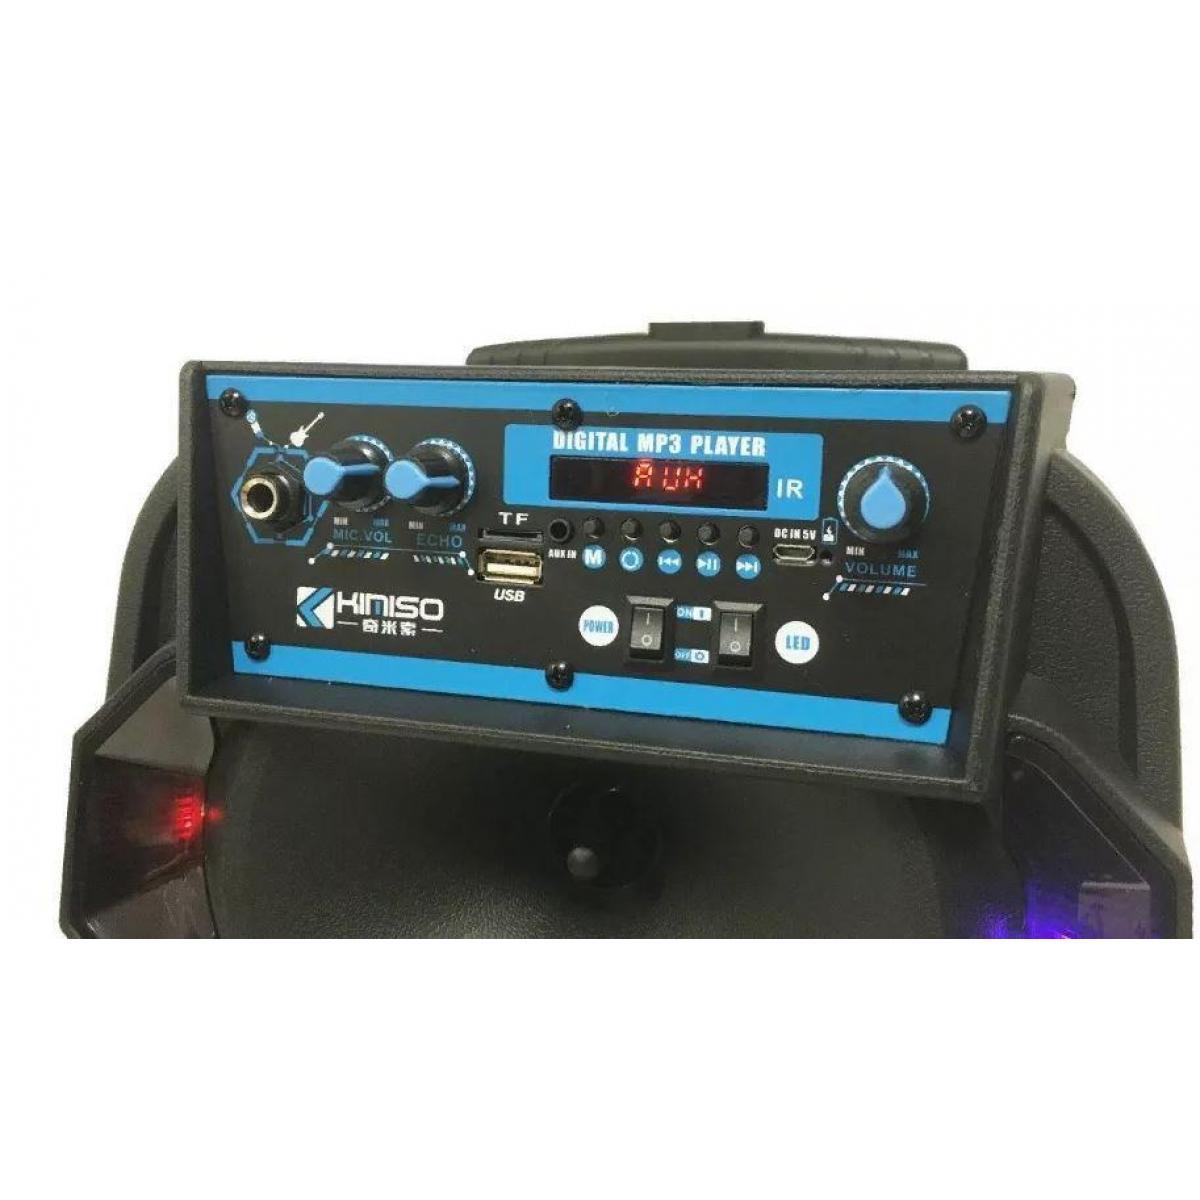 Акустична система Kimiso QS-801 з мікрофоном